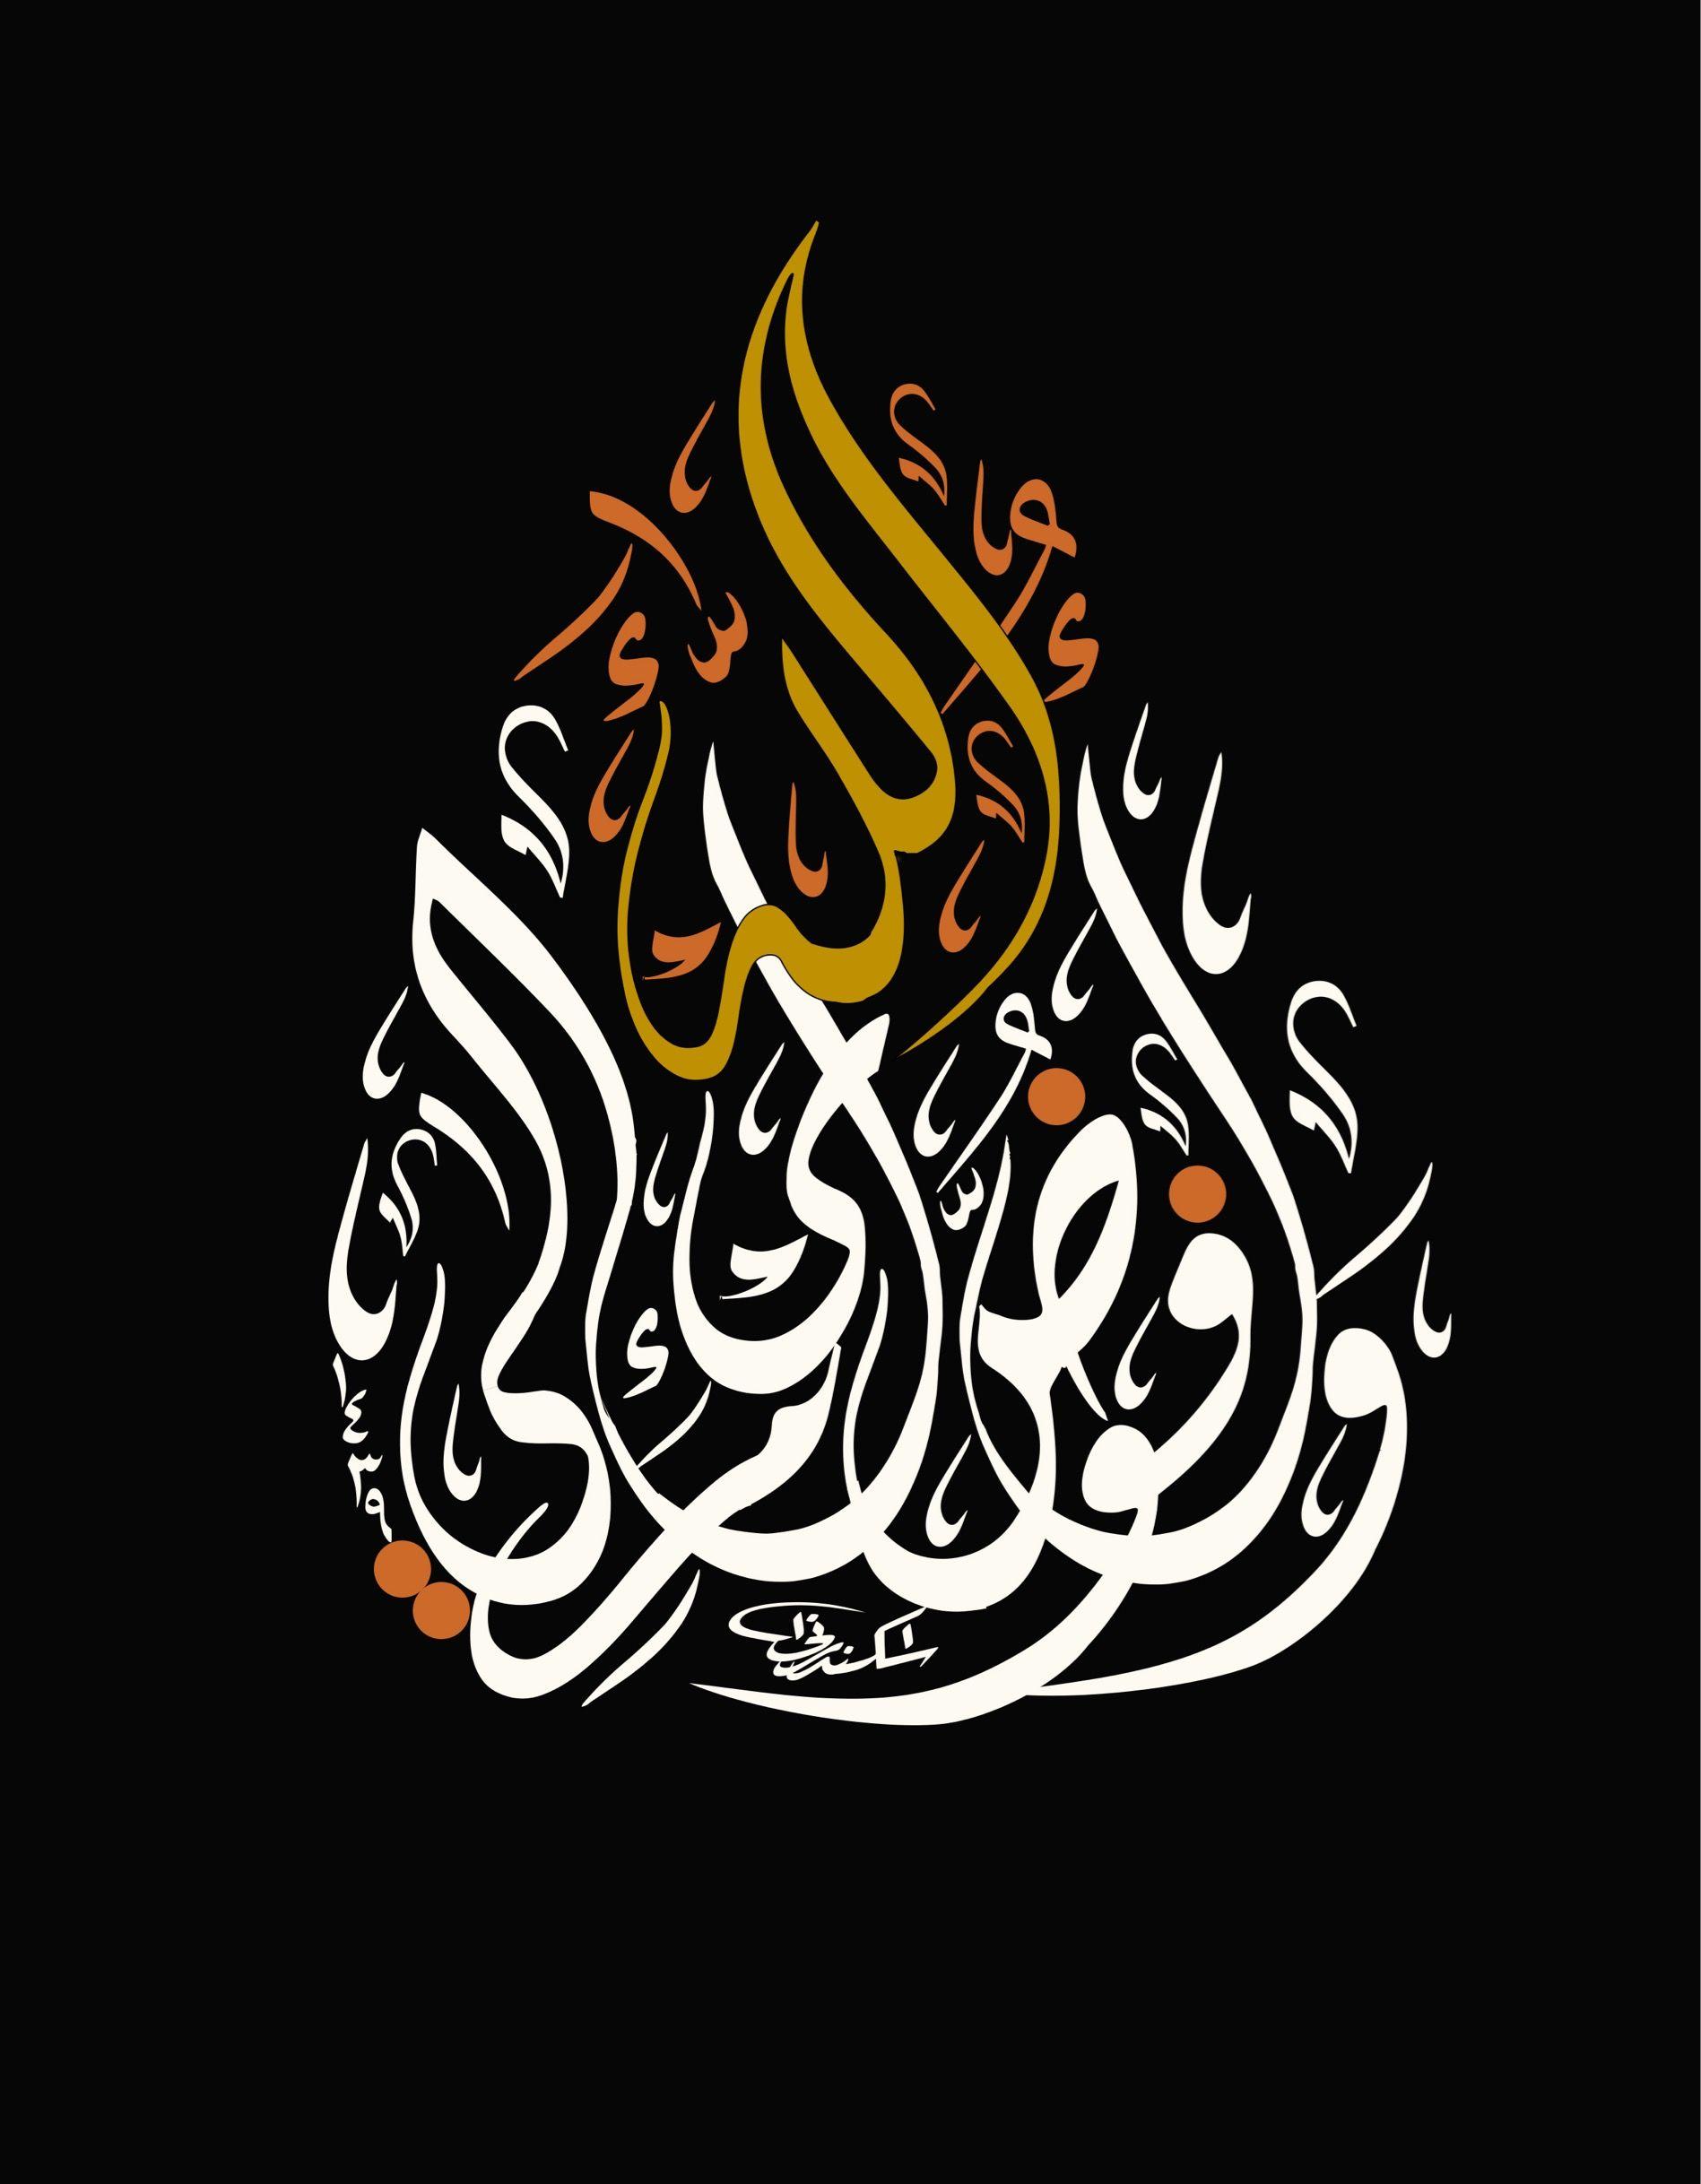 و أ ف و ض أ م ر ي إ ل ى الل ه إ ن الل ه ب ص ير ب ال ع ب اد سورة غافر Islamic Art Calligraphy Islamic Calligraphy Painting Islamic Caligraphy Art